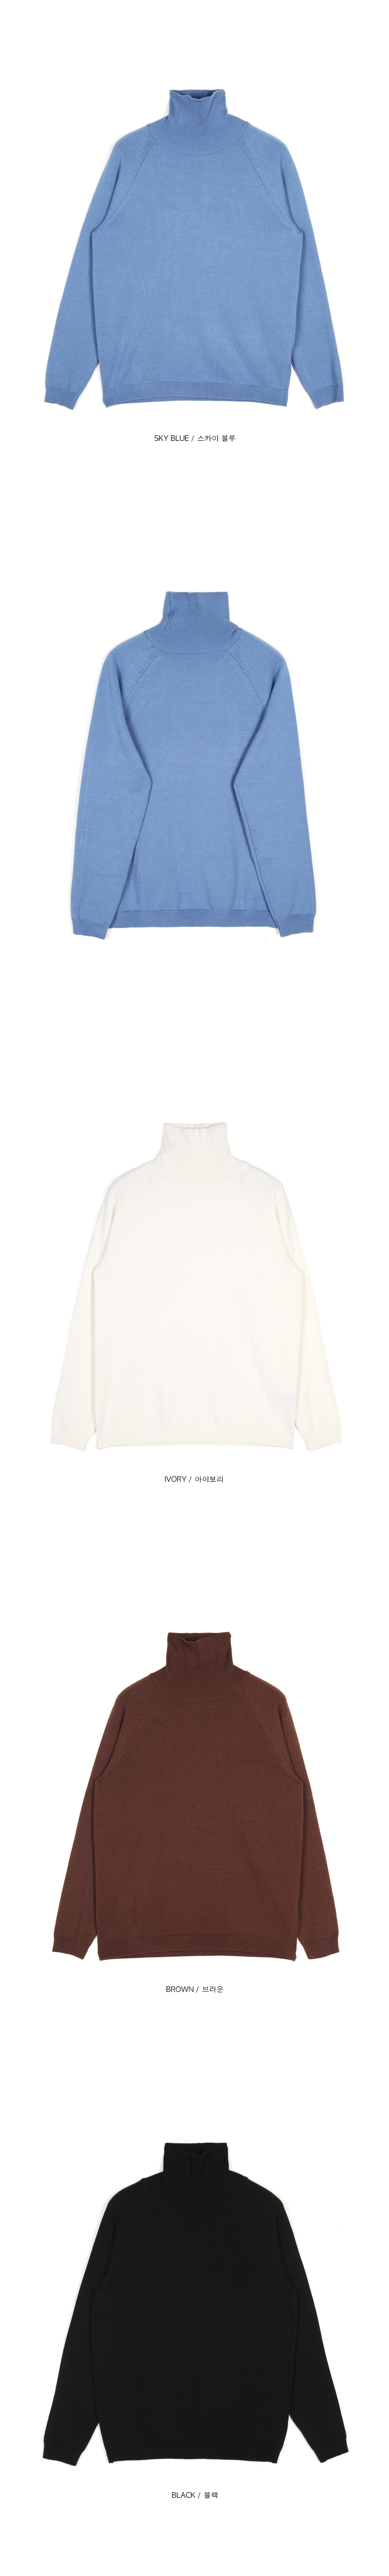 raglan sleeve pola knit (4 color) - UNISEX